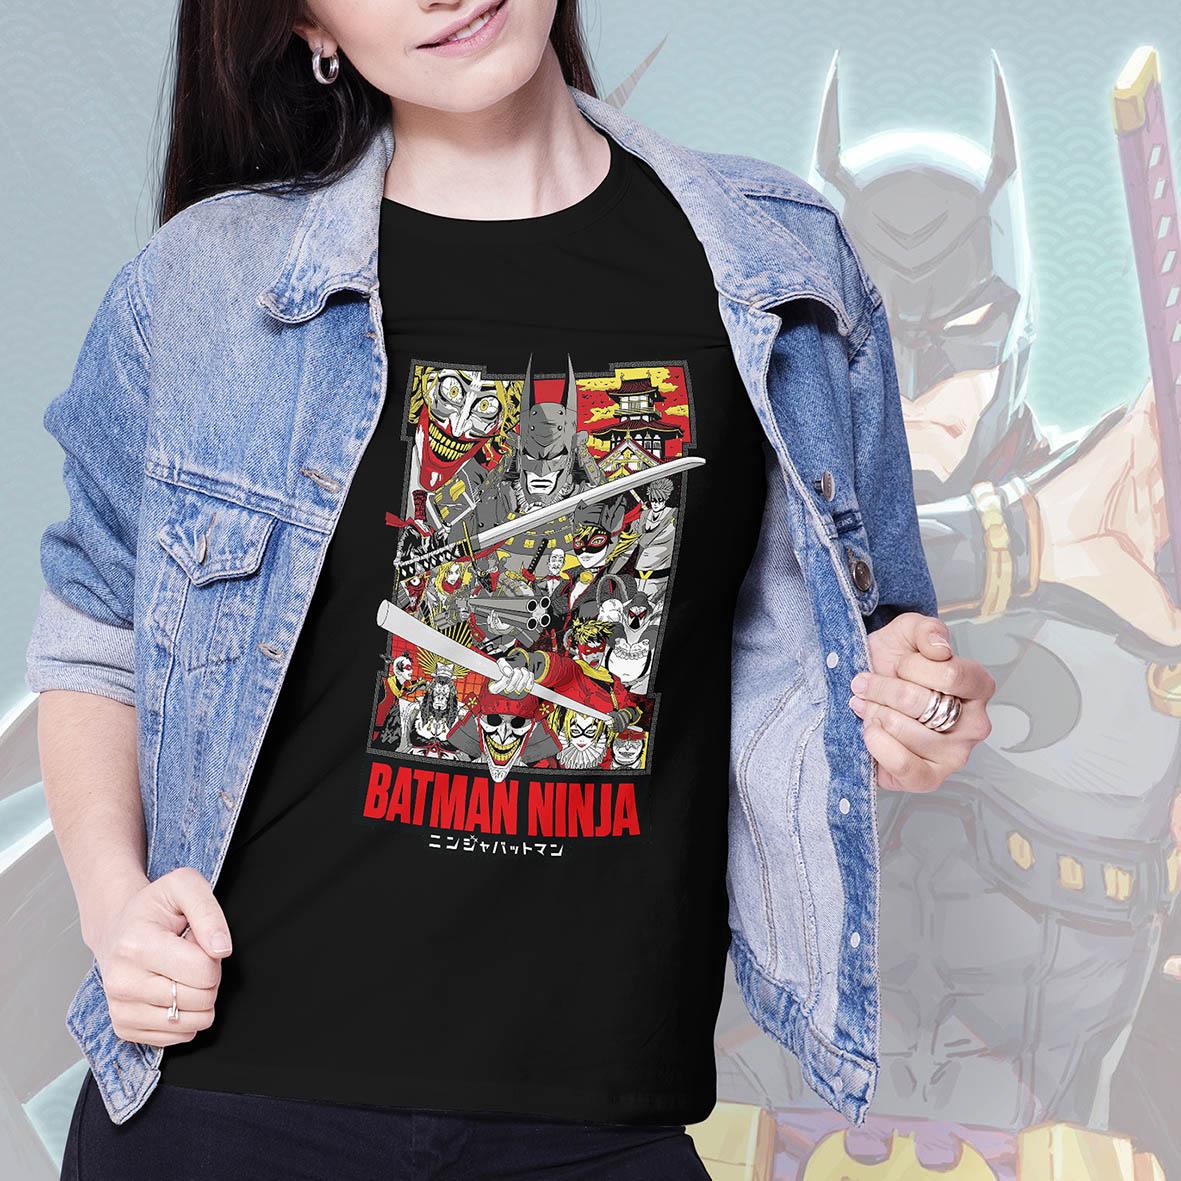 Camiseta Feminina Unissex Batman Ninja Poster (Preta) - EV